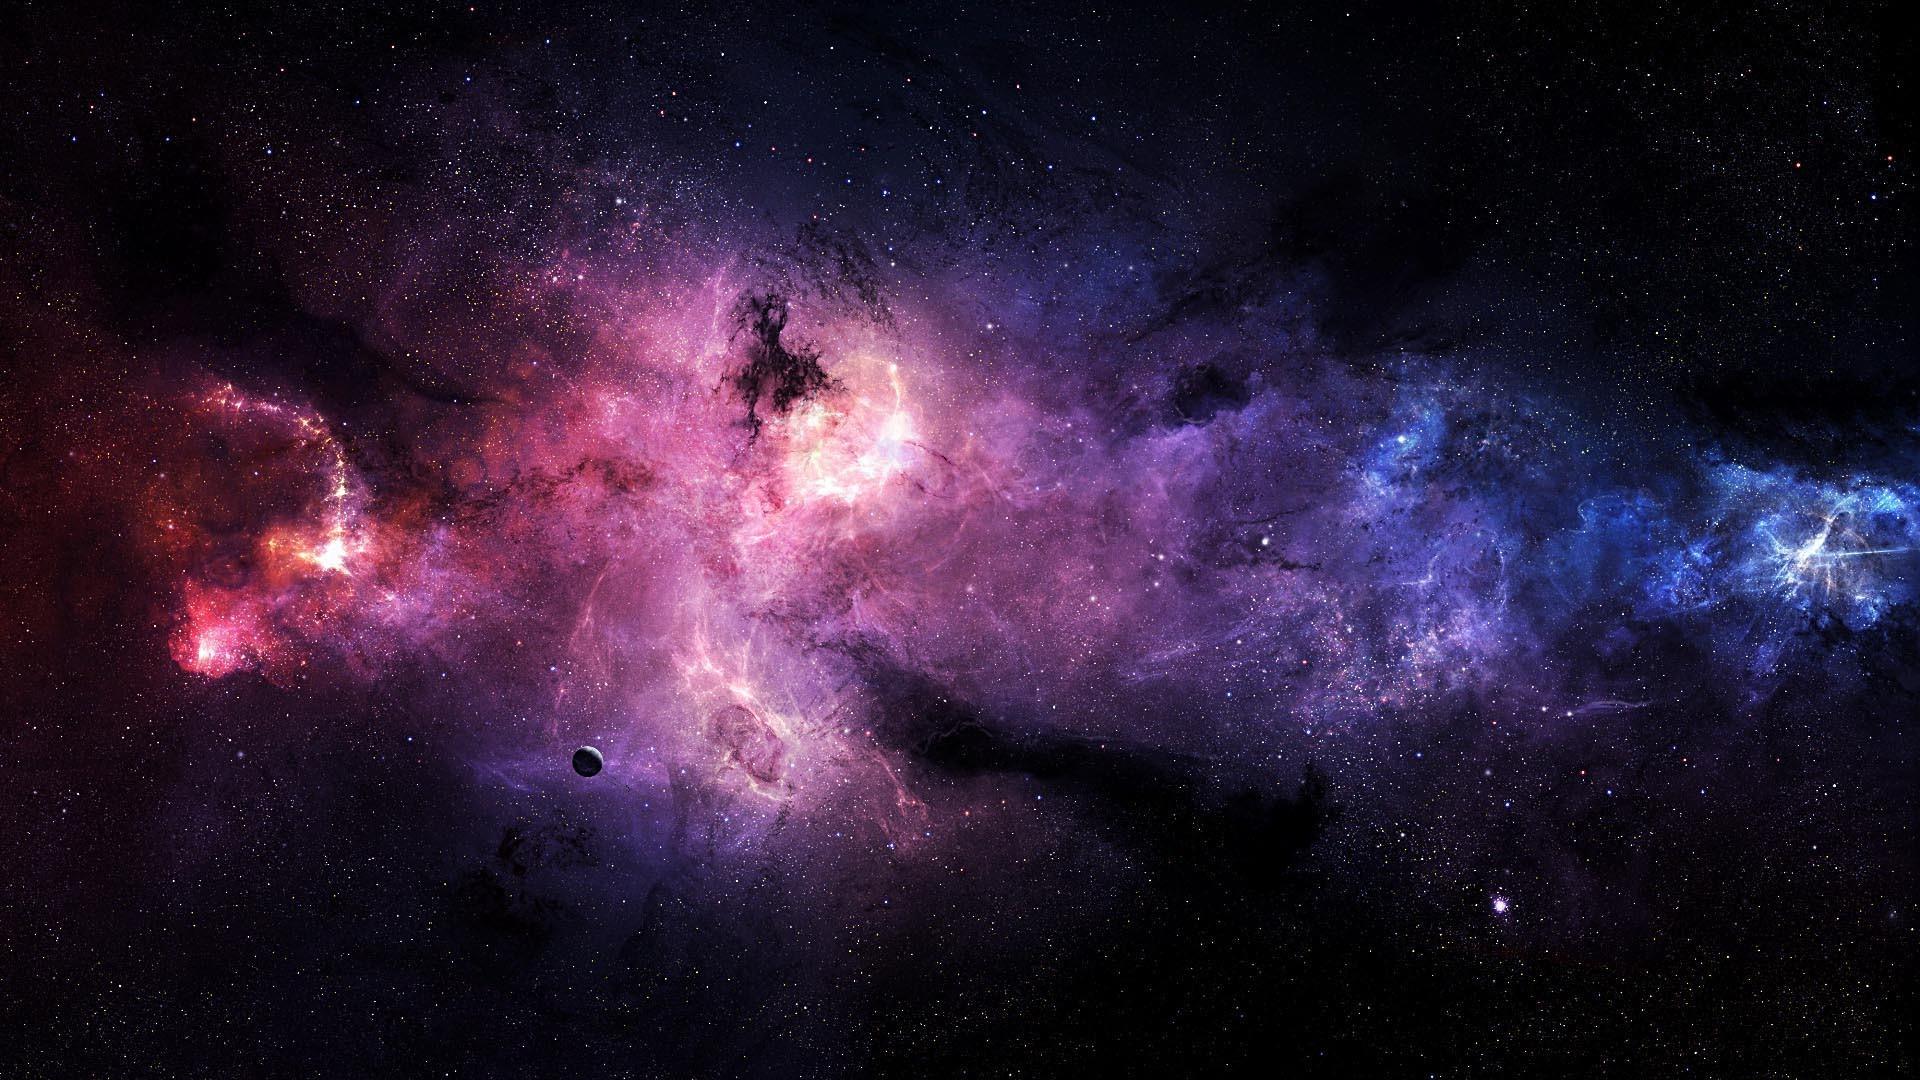 Wallpaper 1920x1080 Px Blue Colorful Nebula Pink Space Stars